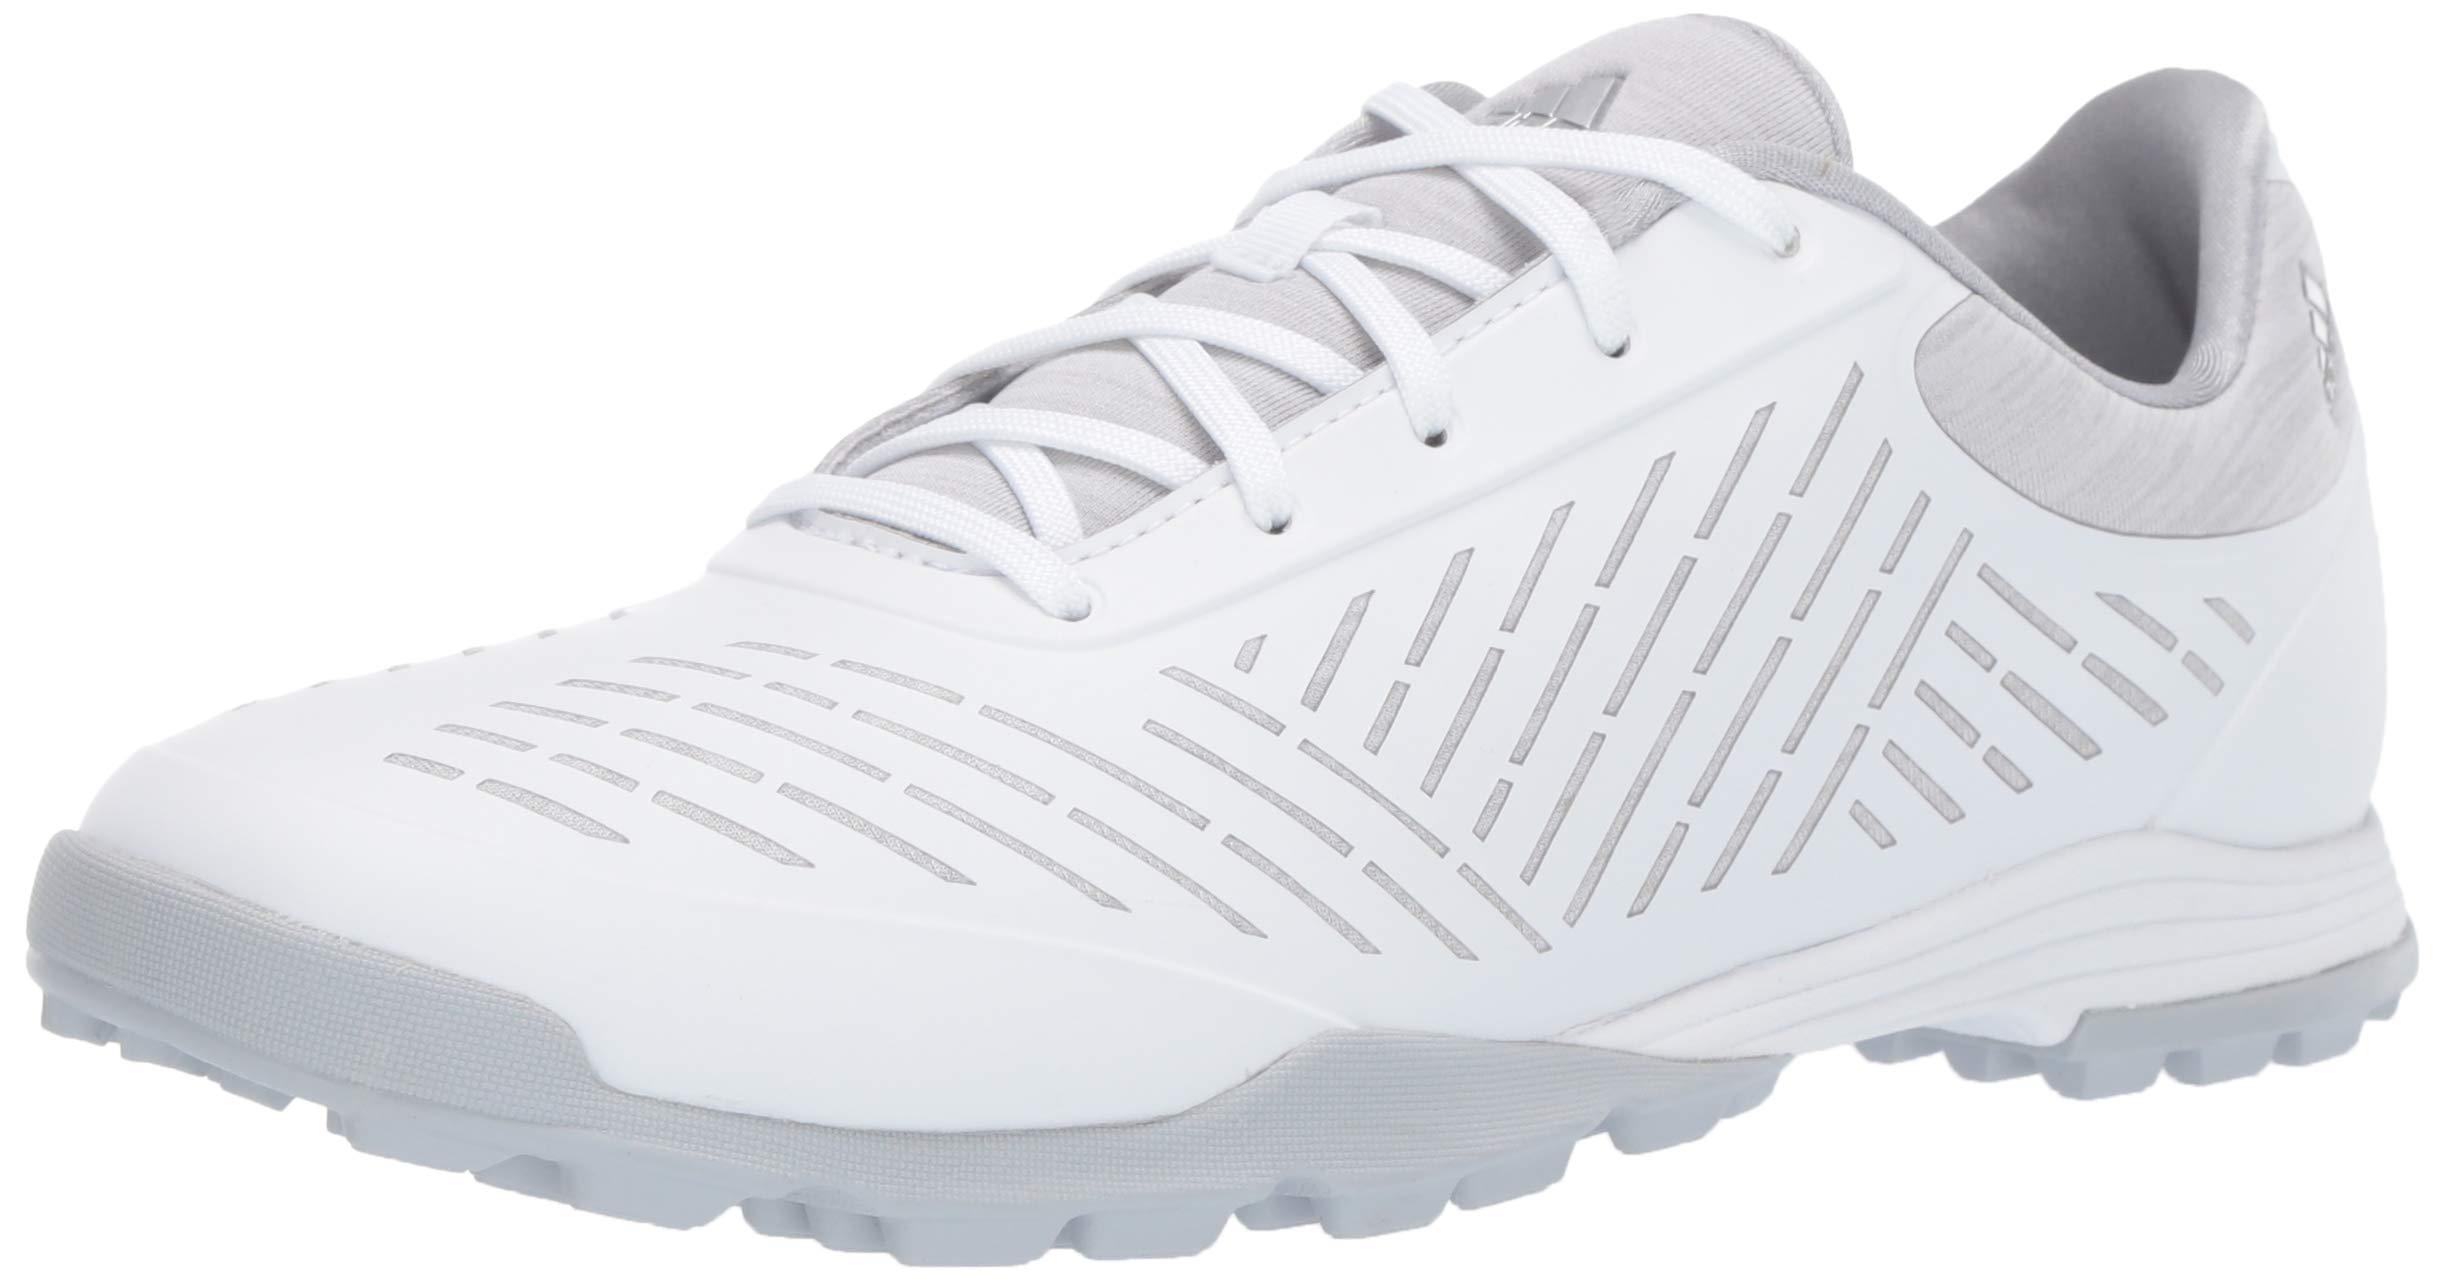 adidas Womens Adipure Sport 2 Golf Shoe, FTWR White/Clear Onix/Silver Metallic 7 M US by adidas